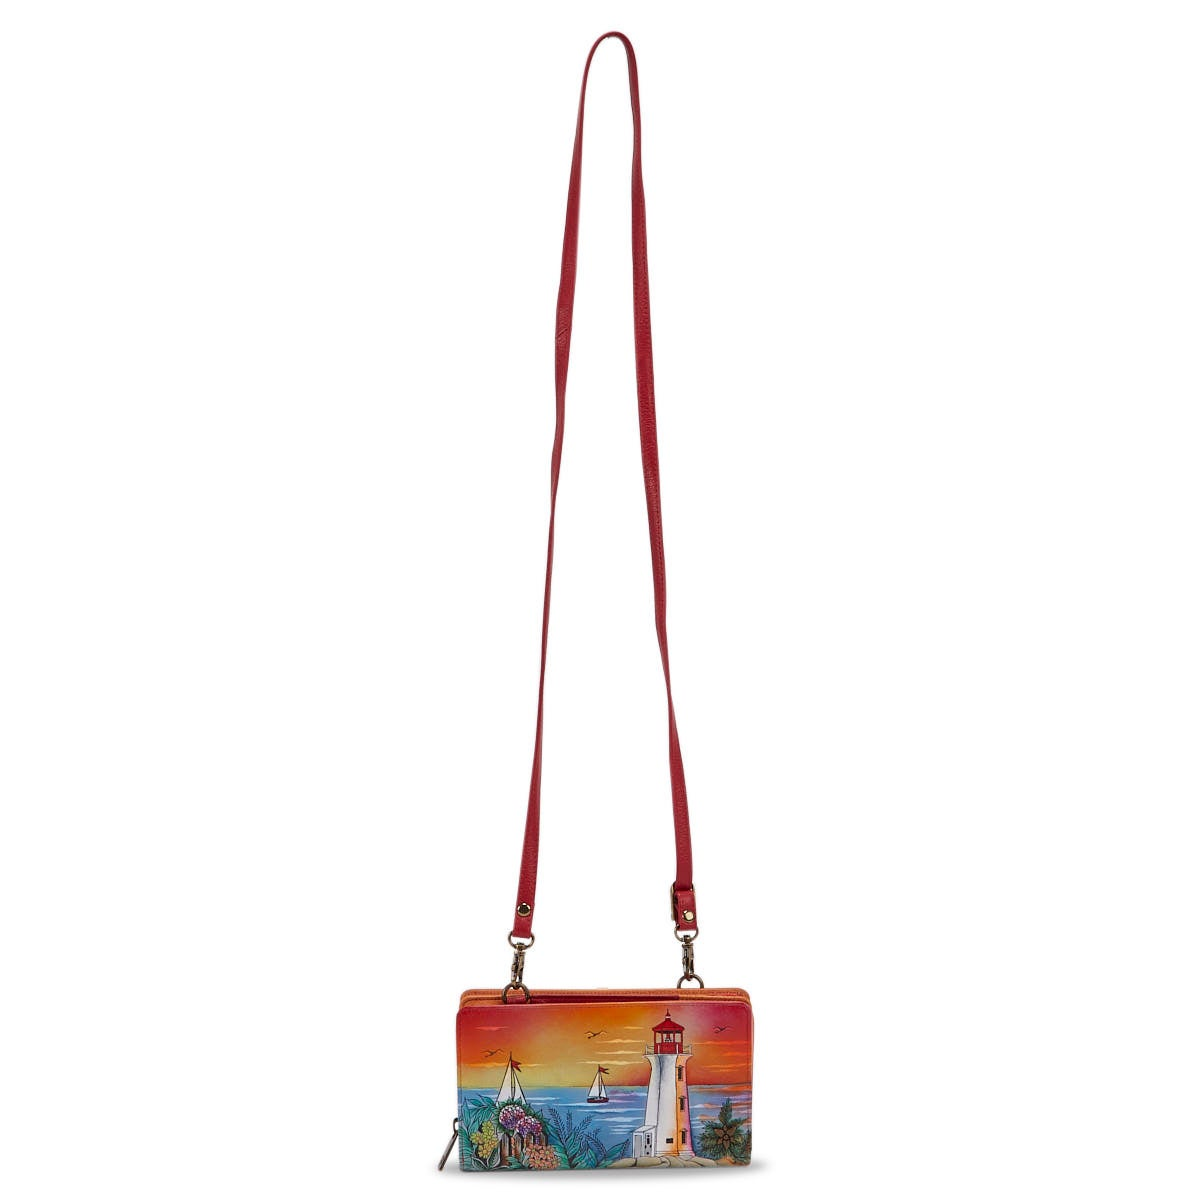 Portefeuille GUIDING LIGHT cuir peint multicolore